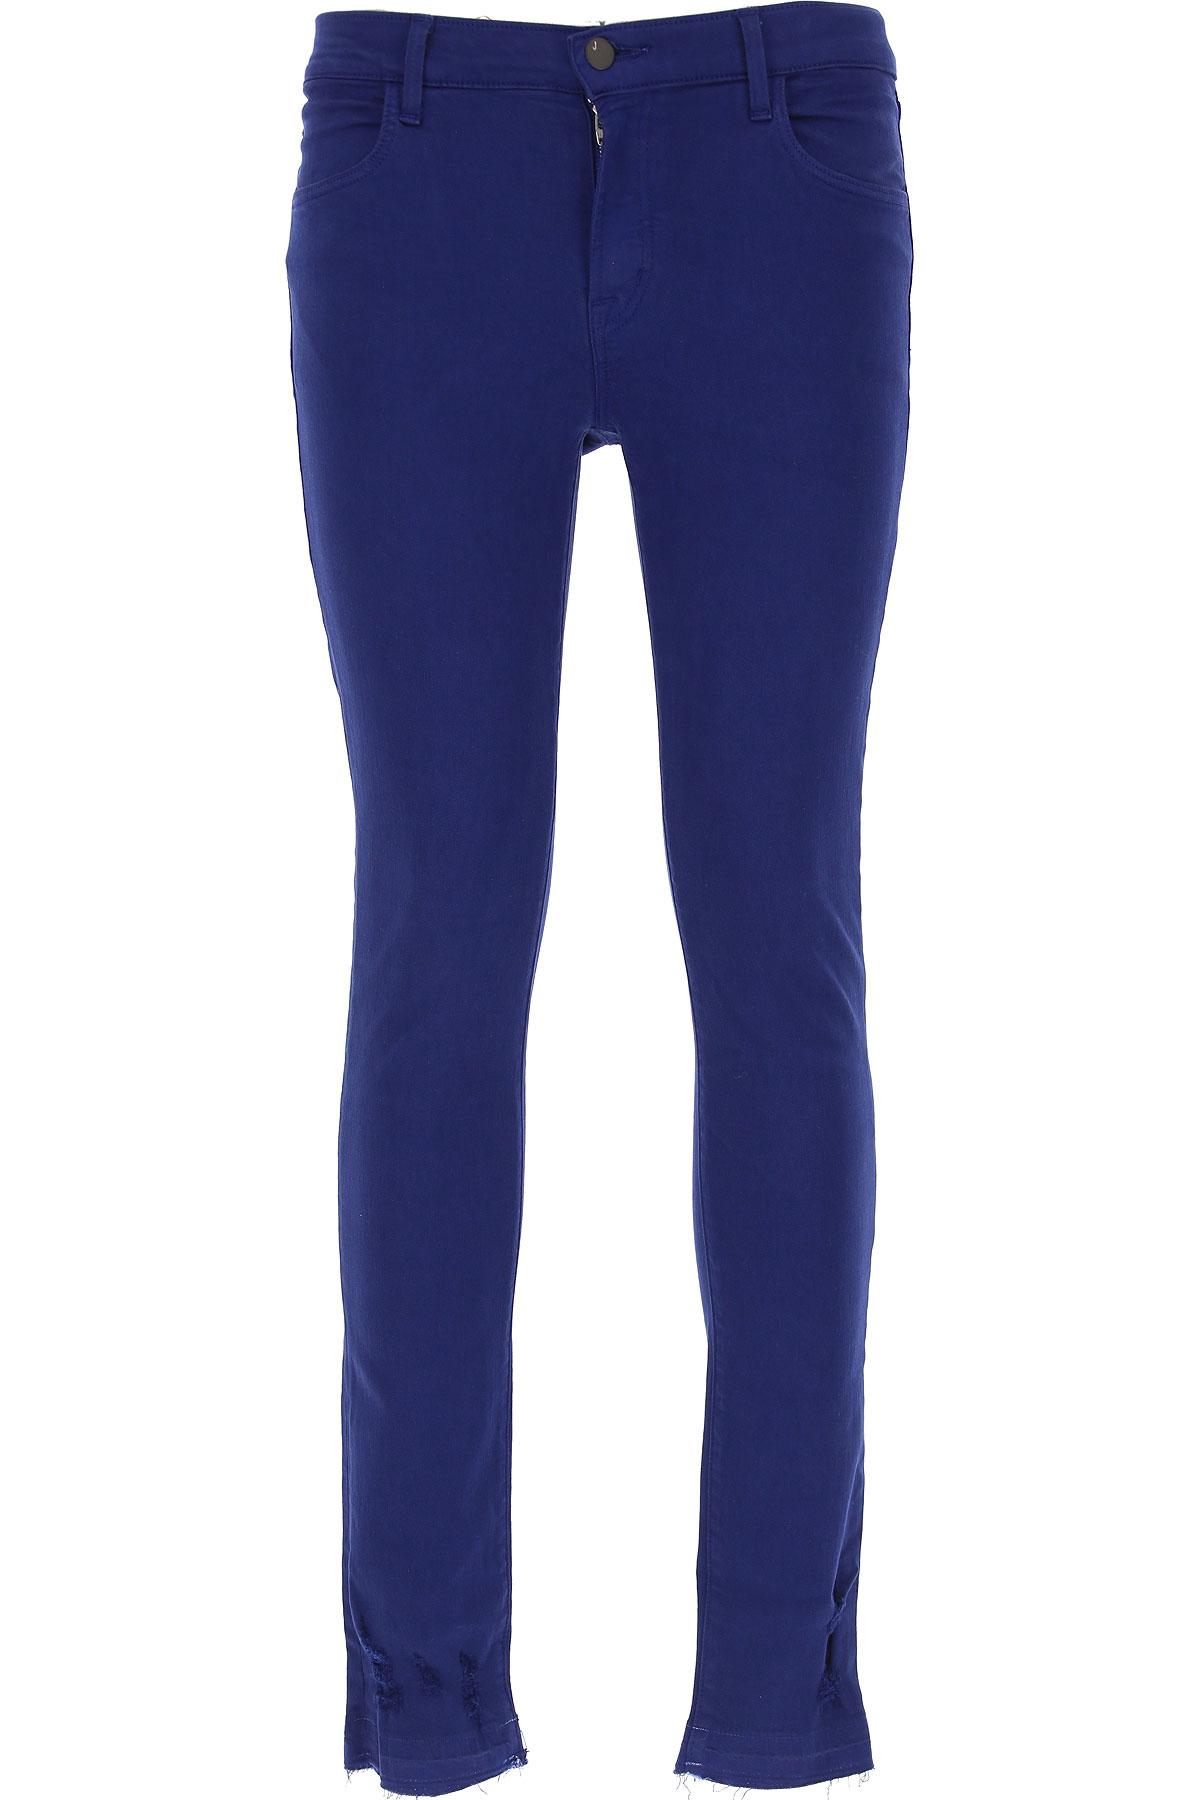 Image of J Brand Jeans, Bluette, Cotton, 2017, 25 27 28 29 30 31 32